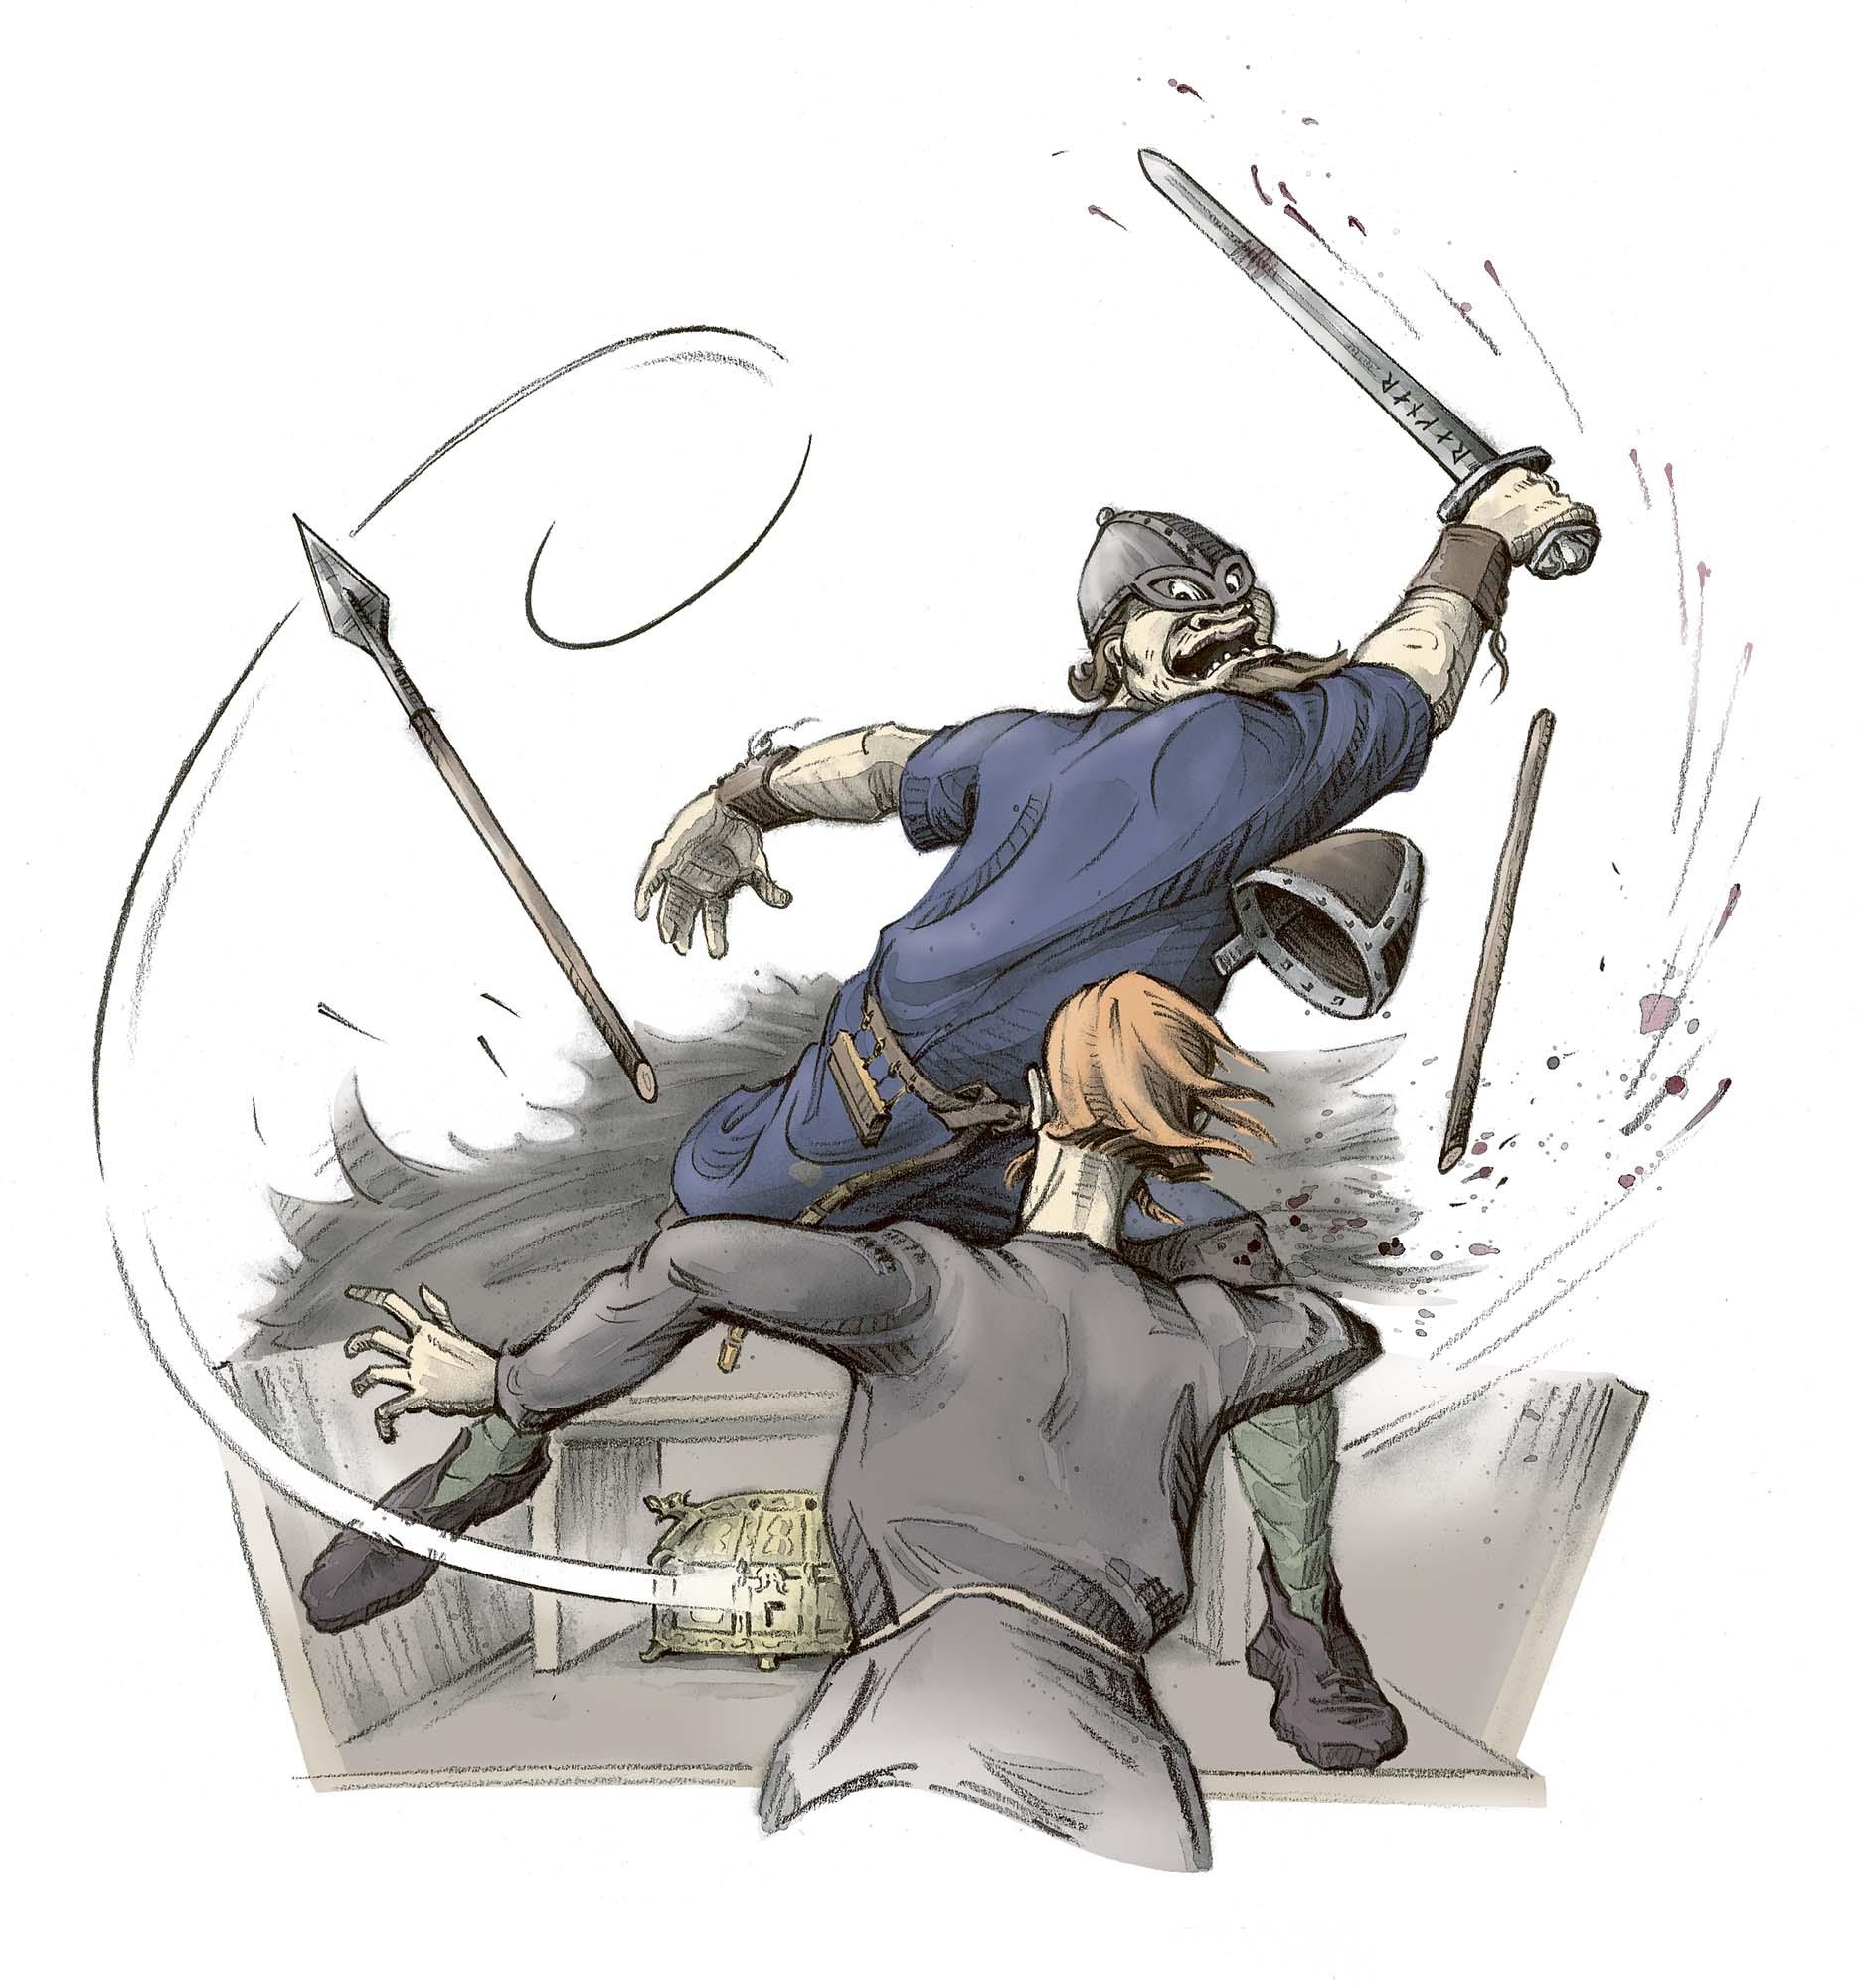 The Chieftain's Cup: Ragnar disarms the guard (Client: Bonnier Carlsen Publishing House, Sweden).